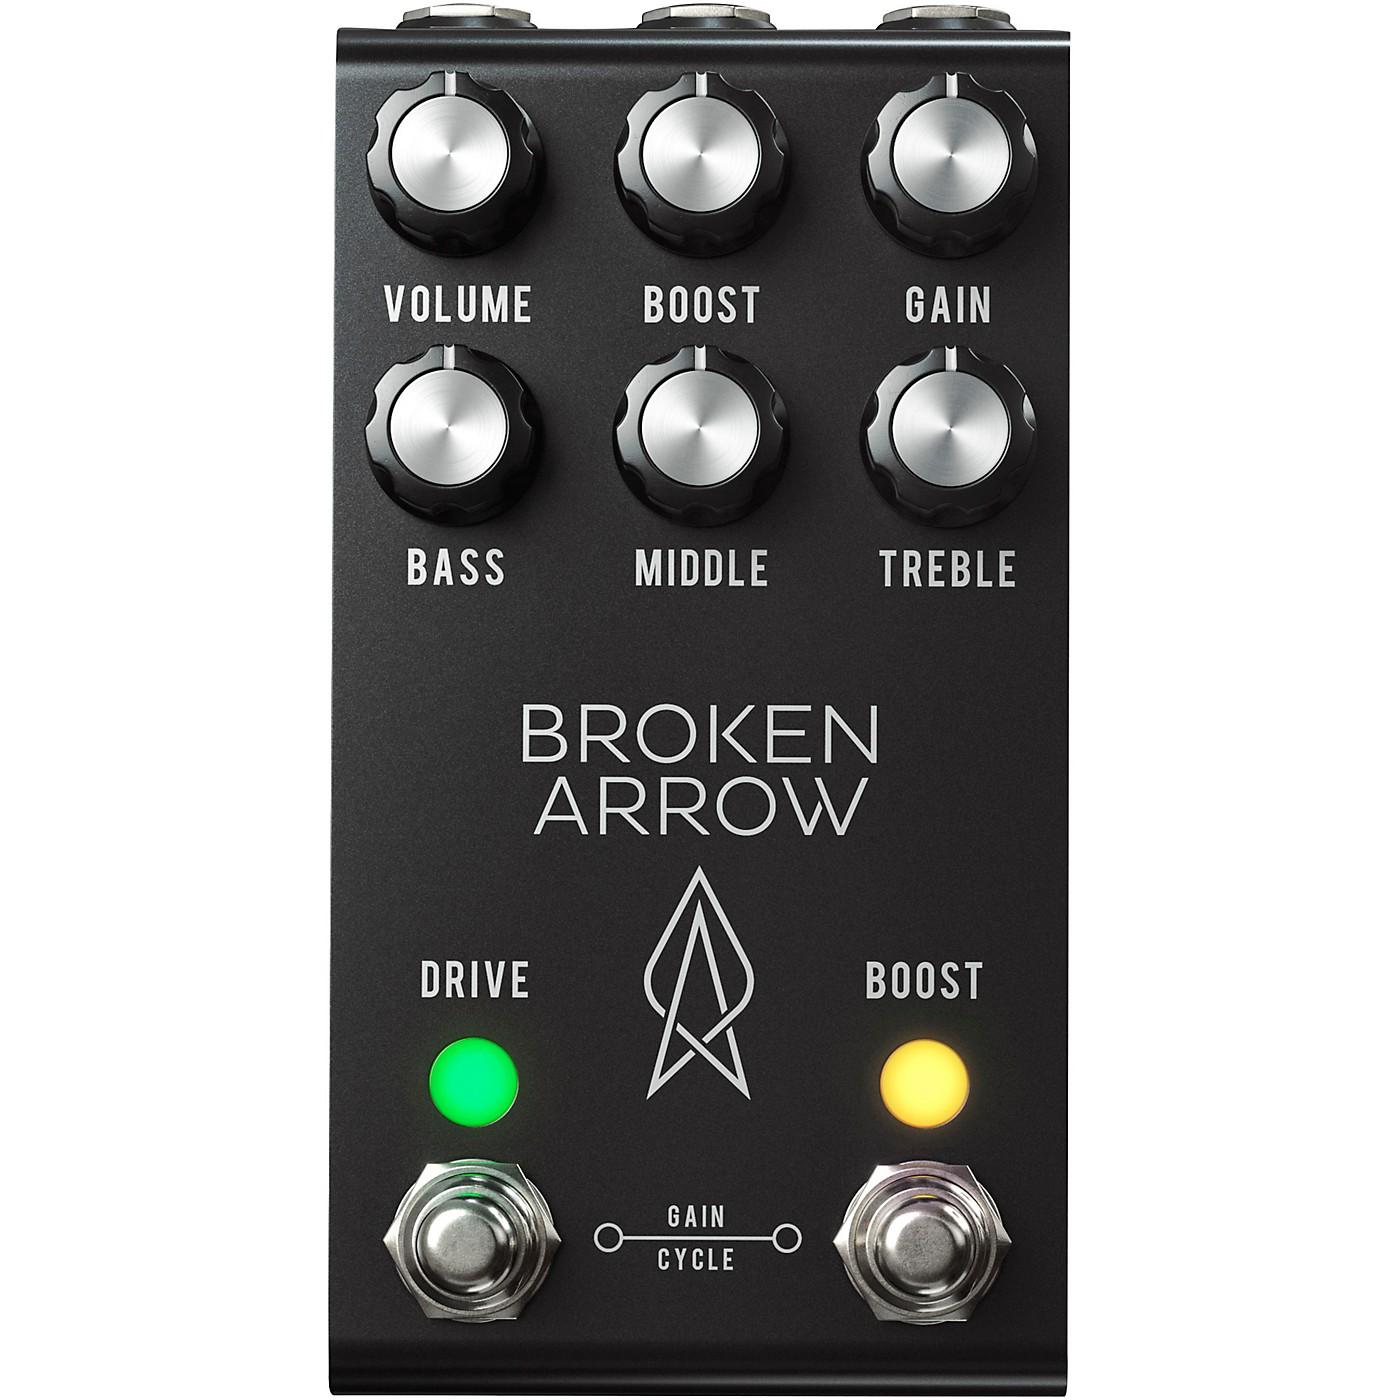 Jackson Audio Broken Arrow v2 Overdrive Effects Pedal - Black thumbnail